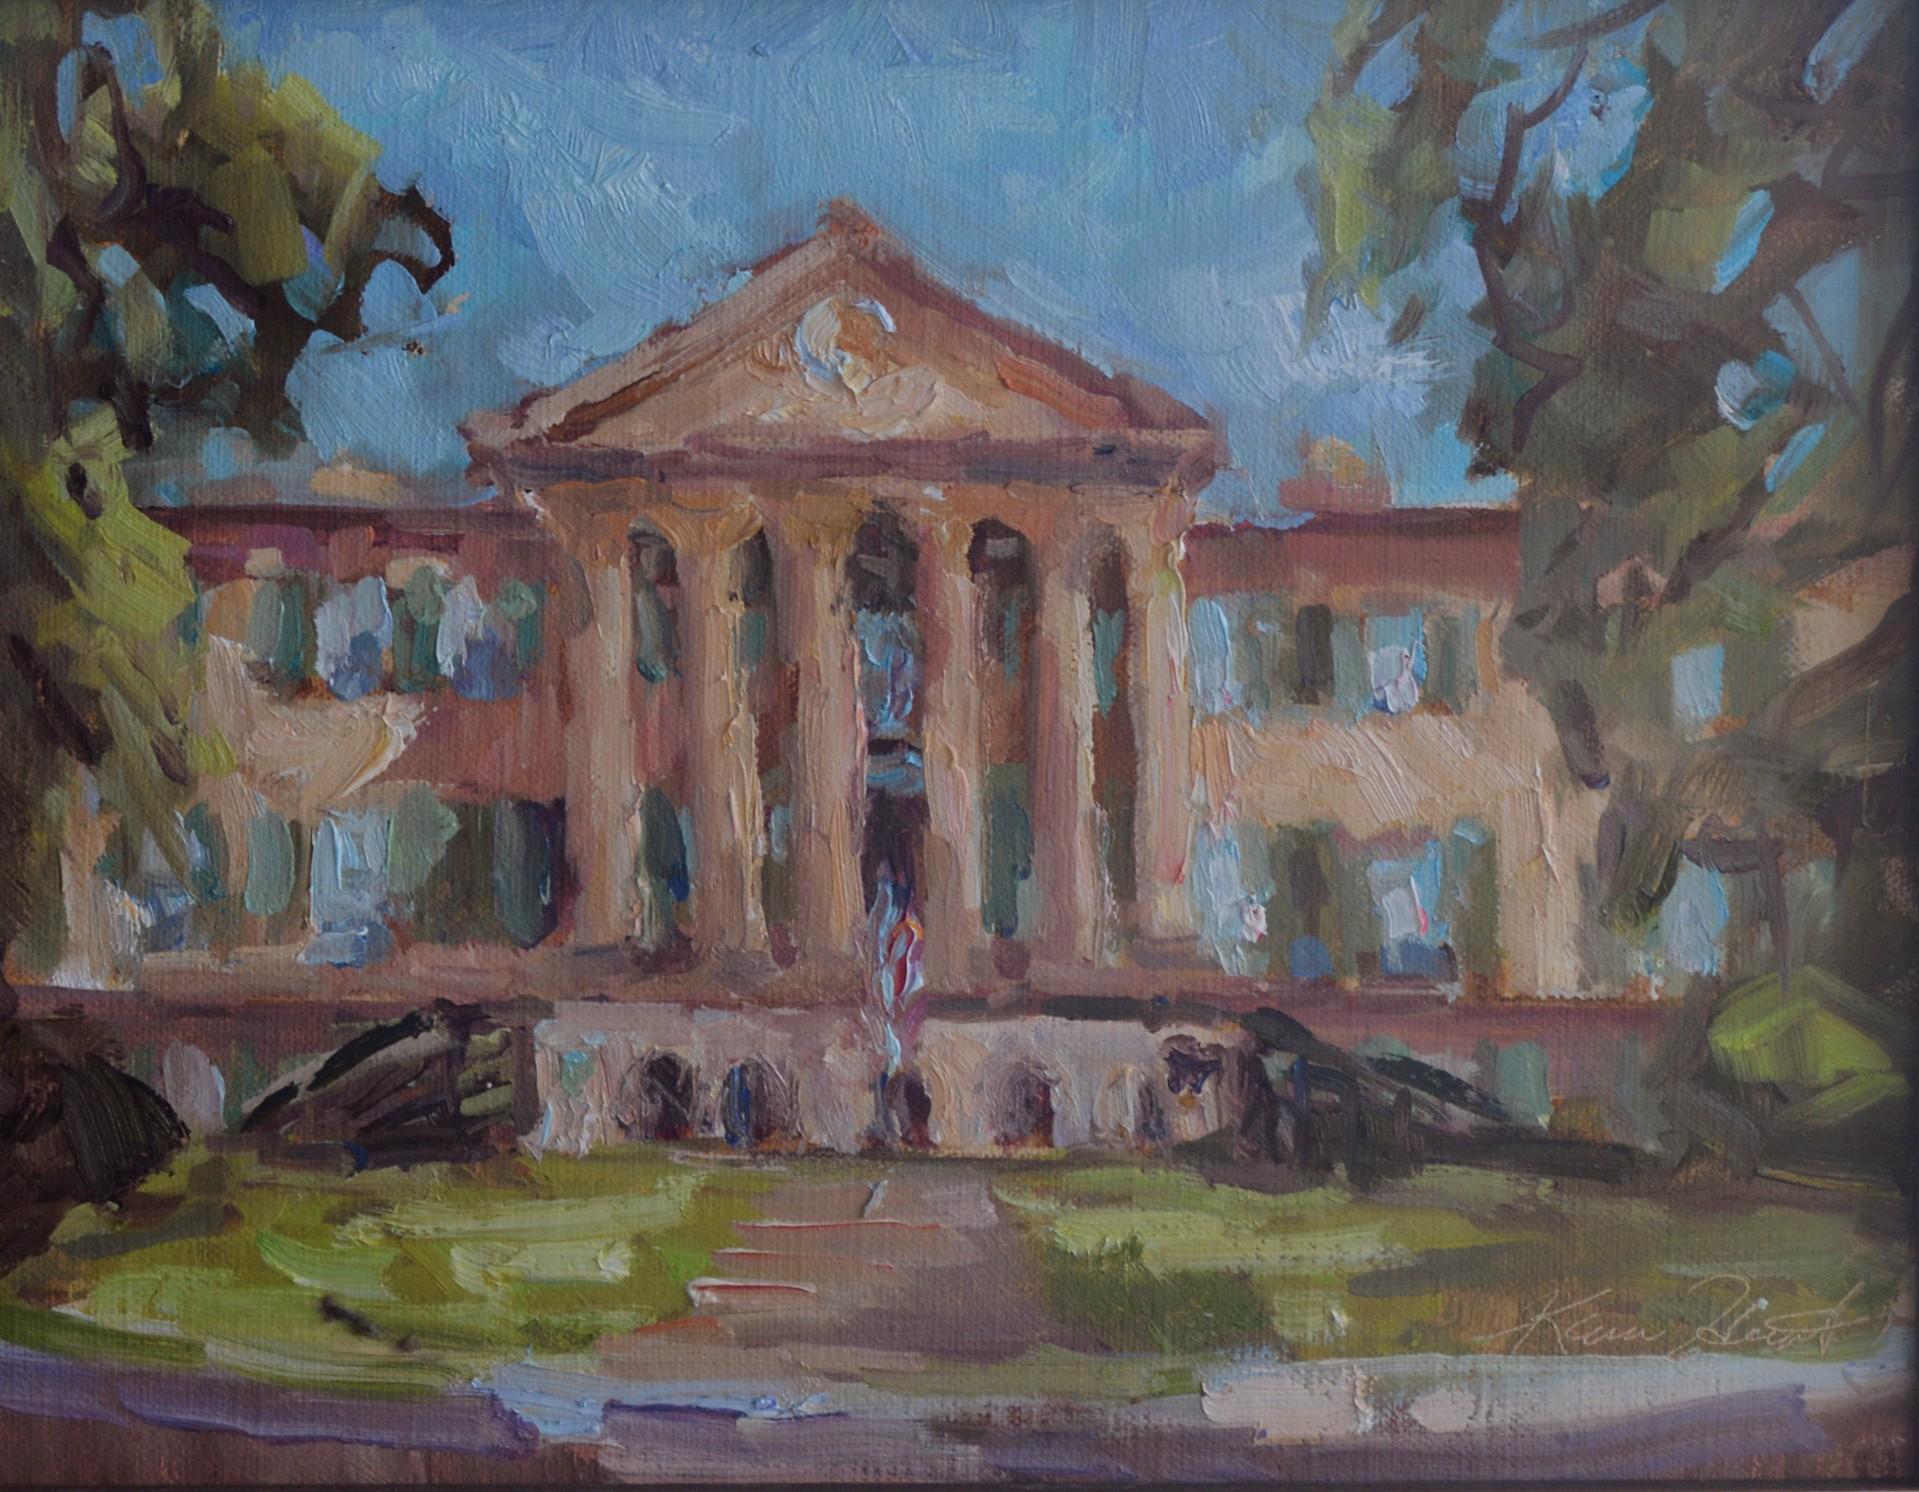 The Cistern at the College of Charleston by Karen Hewitt Hagan